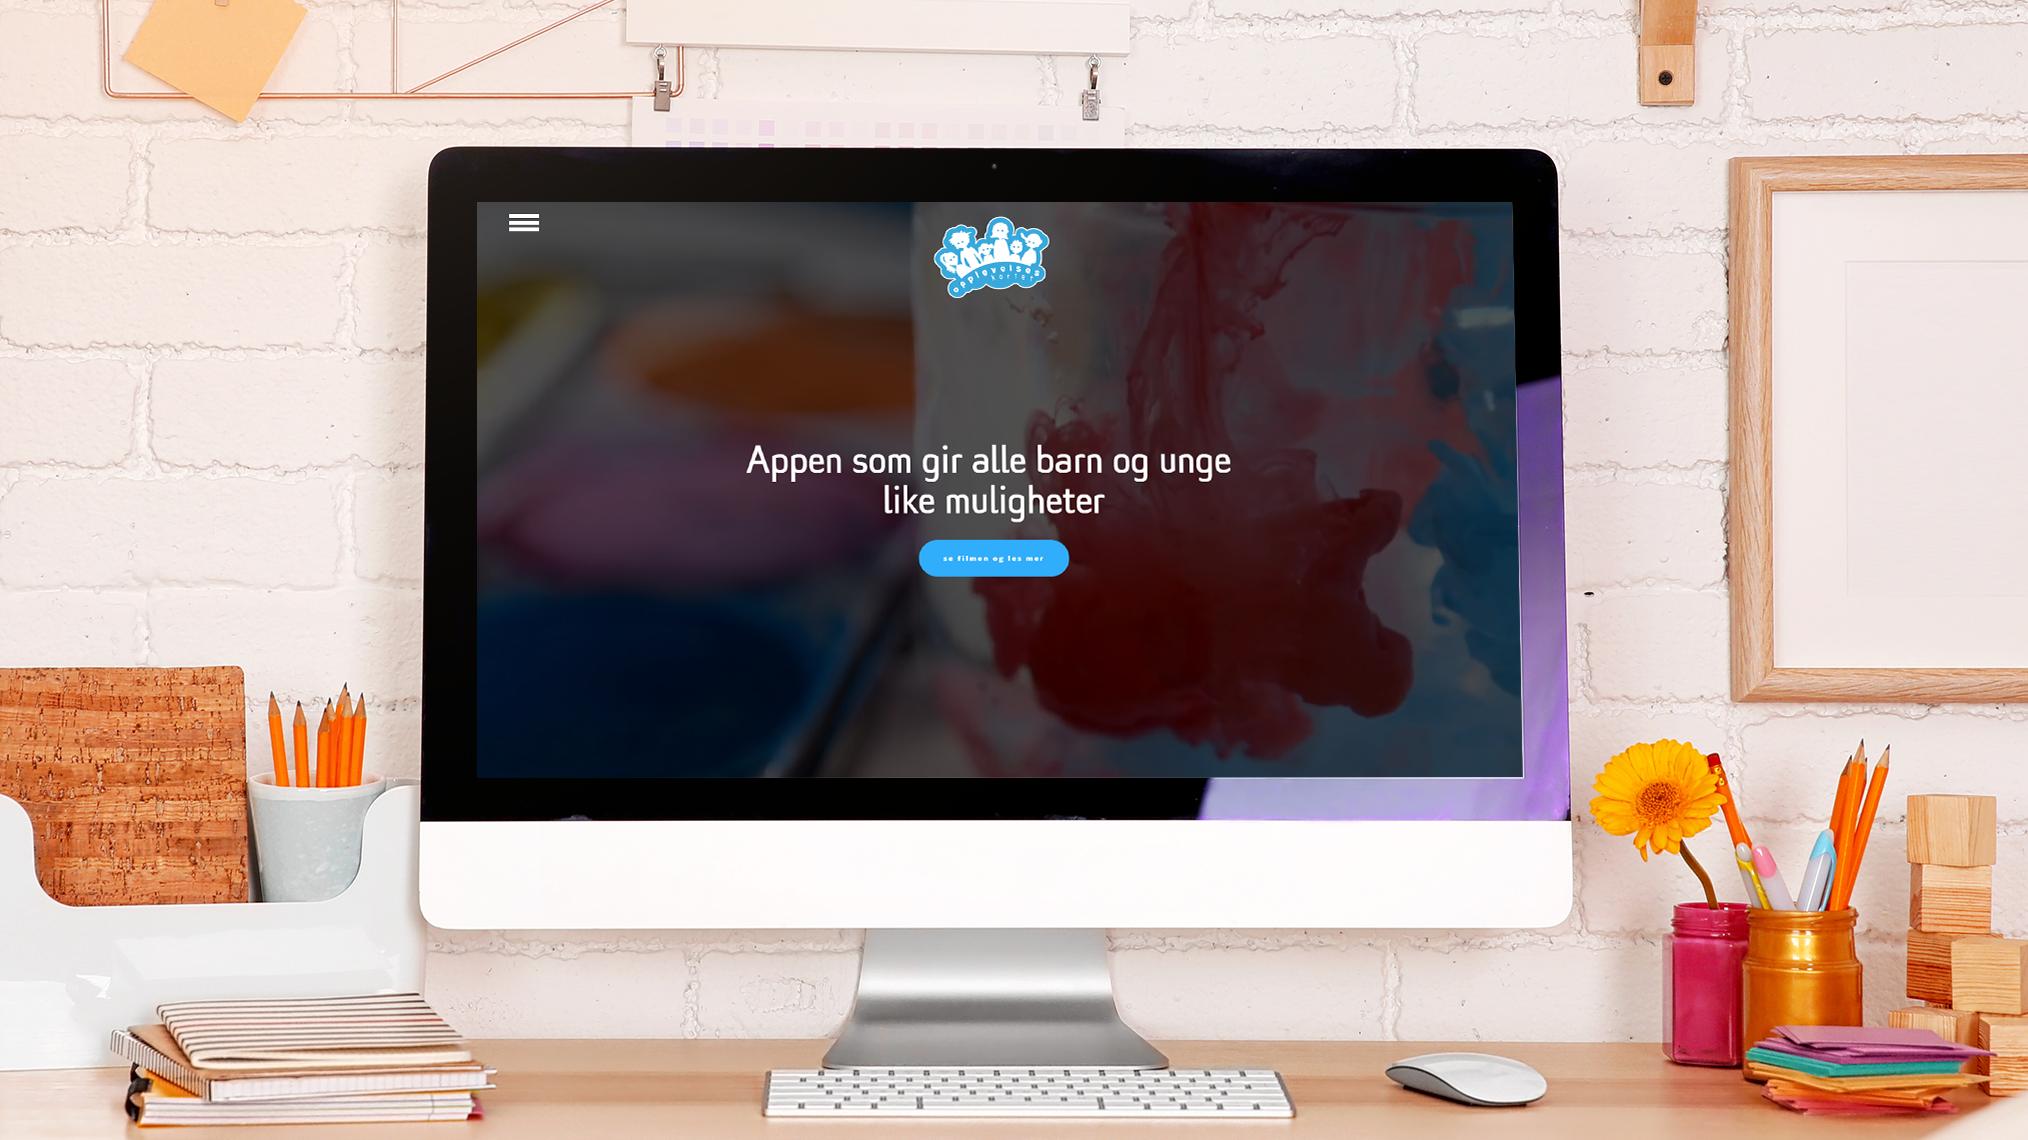 iMac-Desktop-Workspace-Mockup-Free-PSD.png